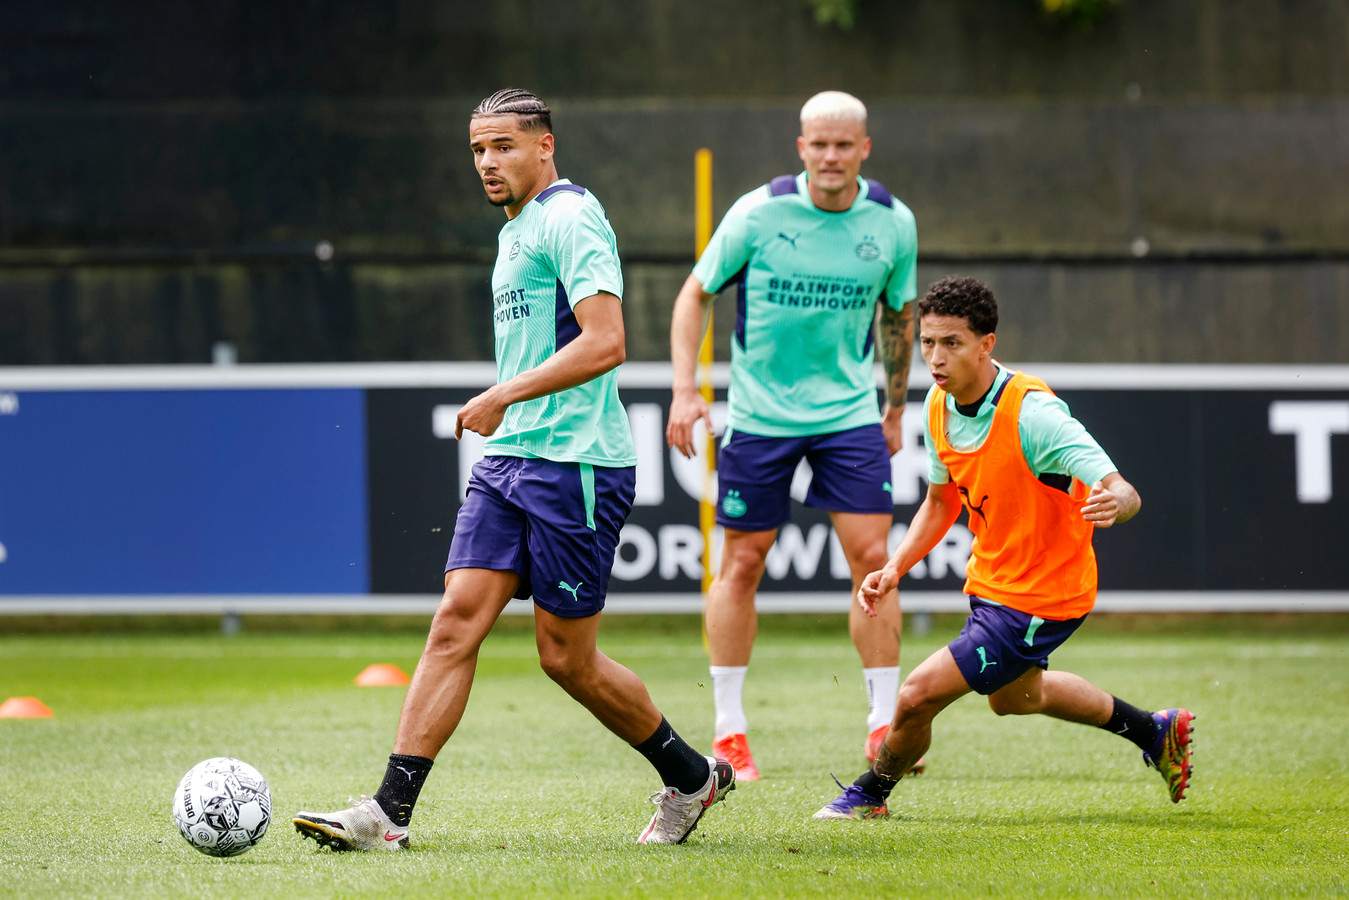 Armando Obispo en Mauro Júnior tijdens een training van PSV. Philipp Max kijkt toe.